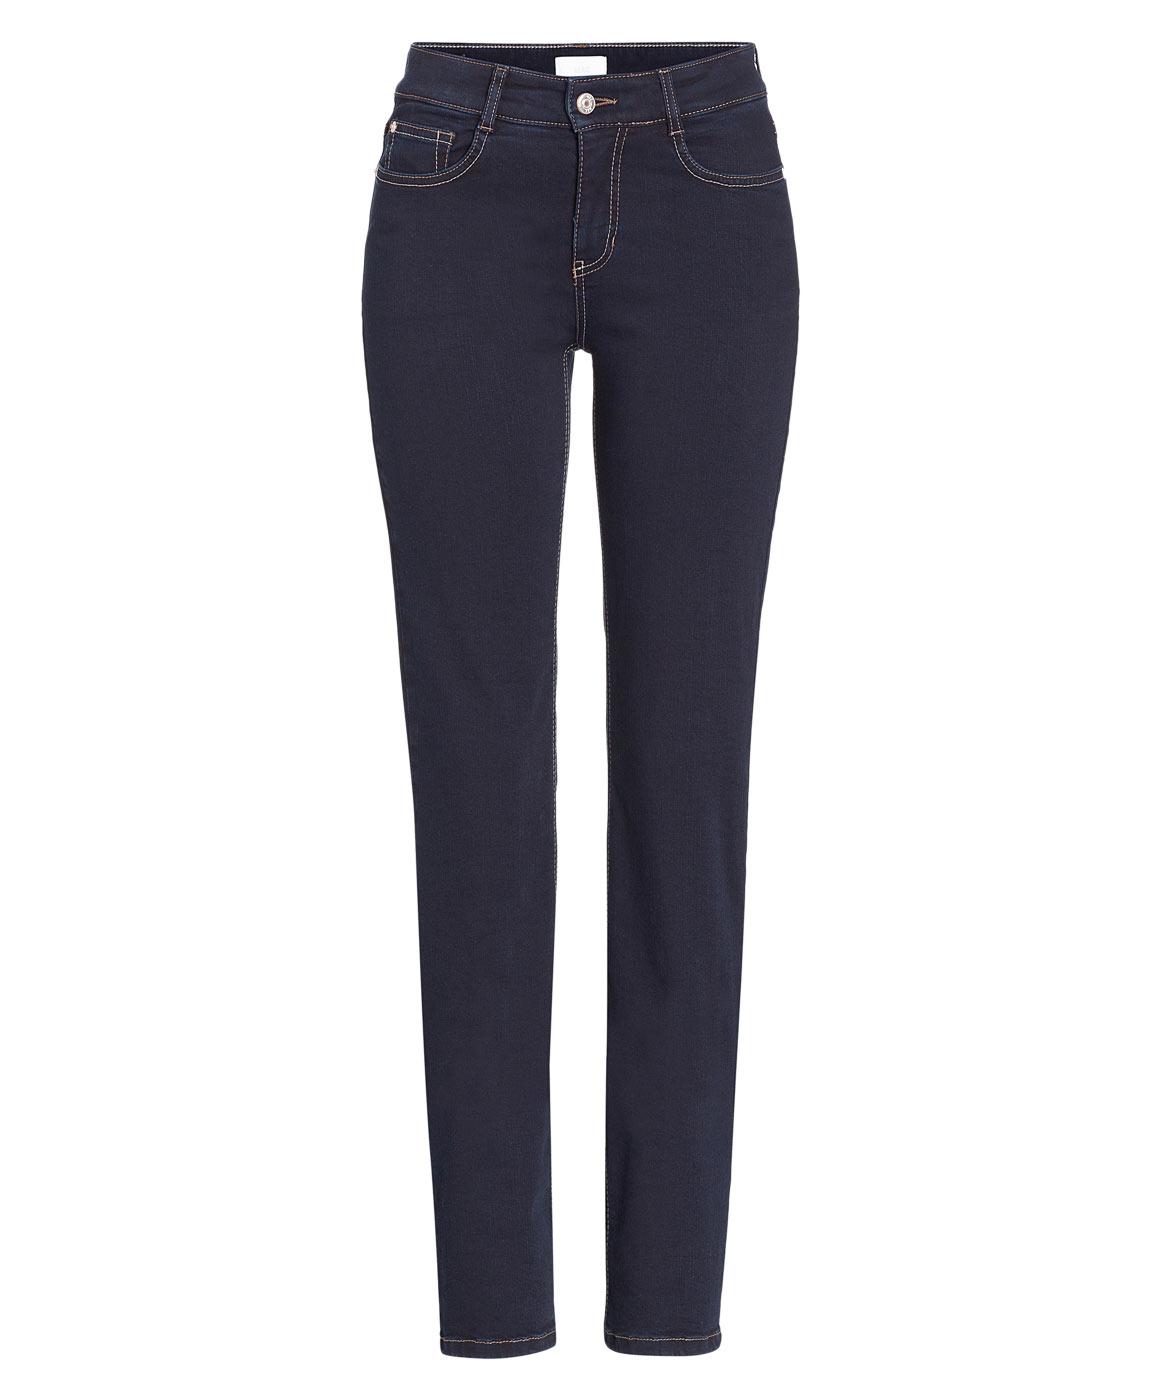 Angela Jeans Slim Fit dark rinsewash